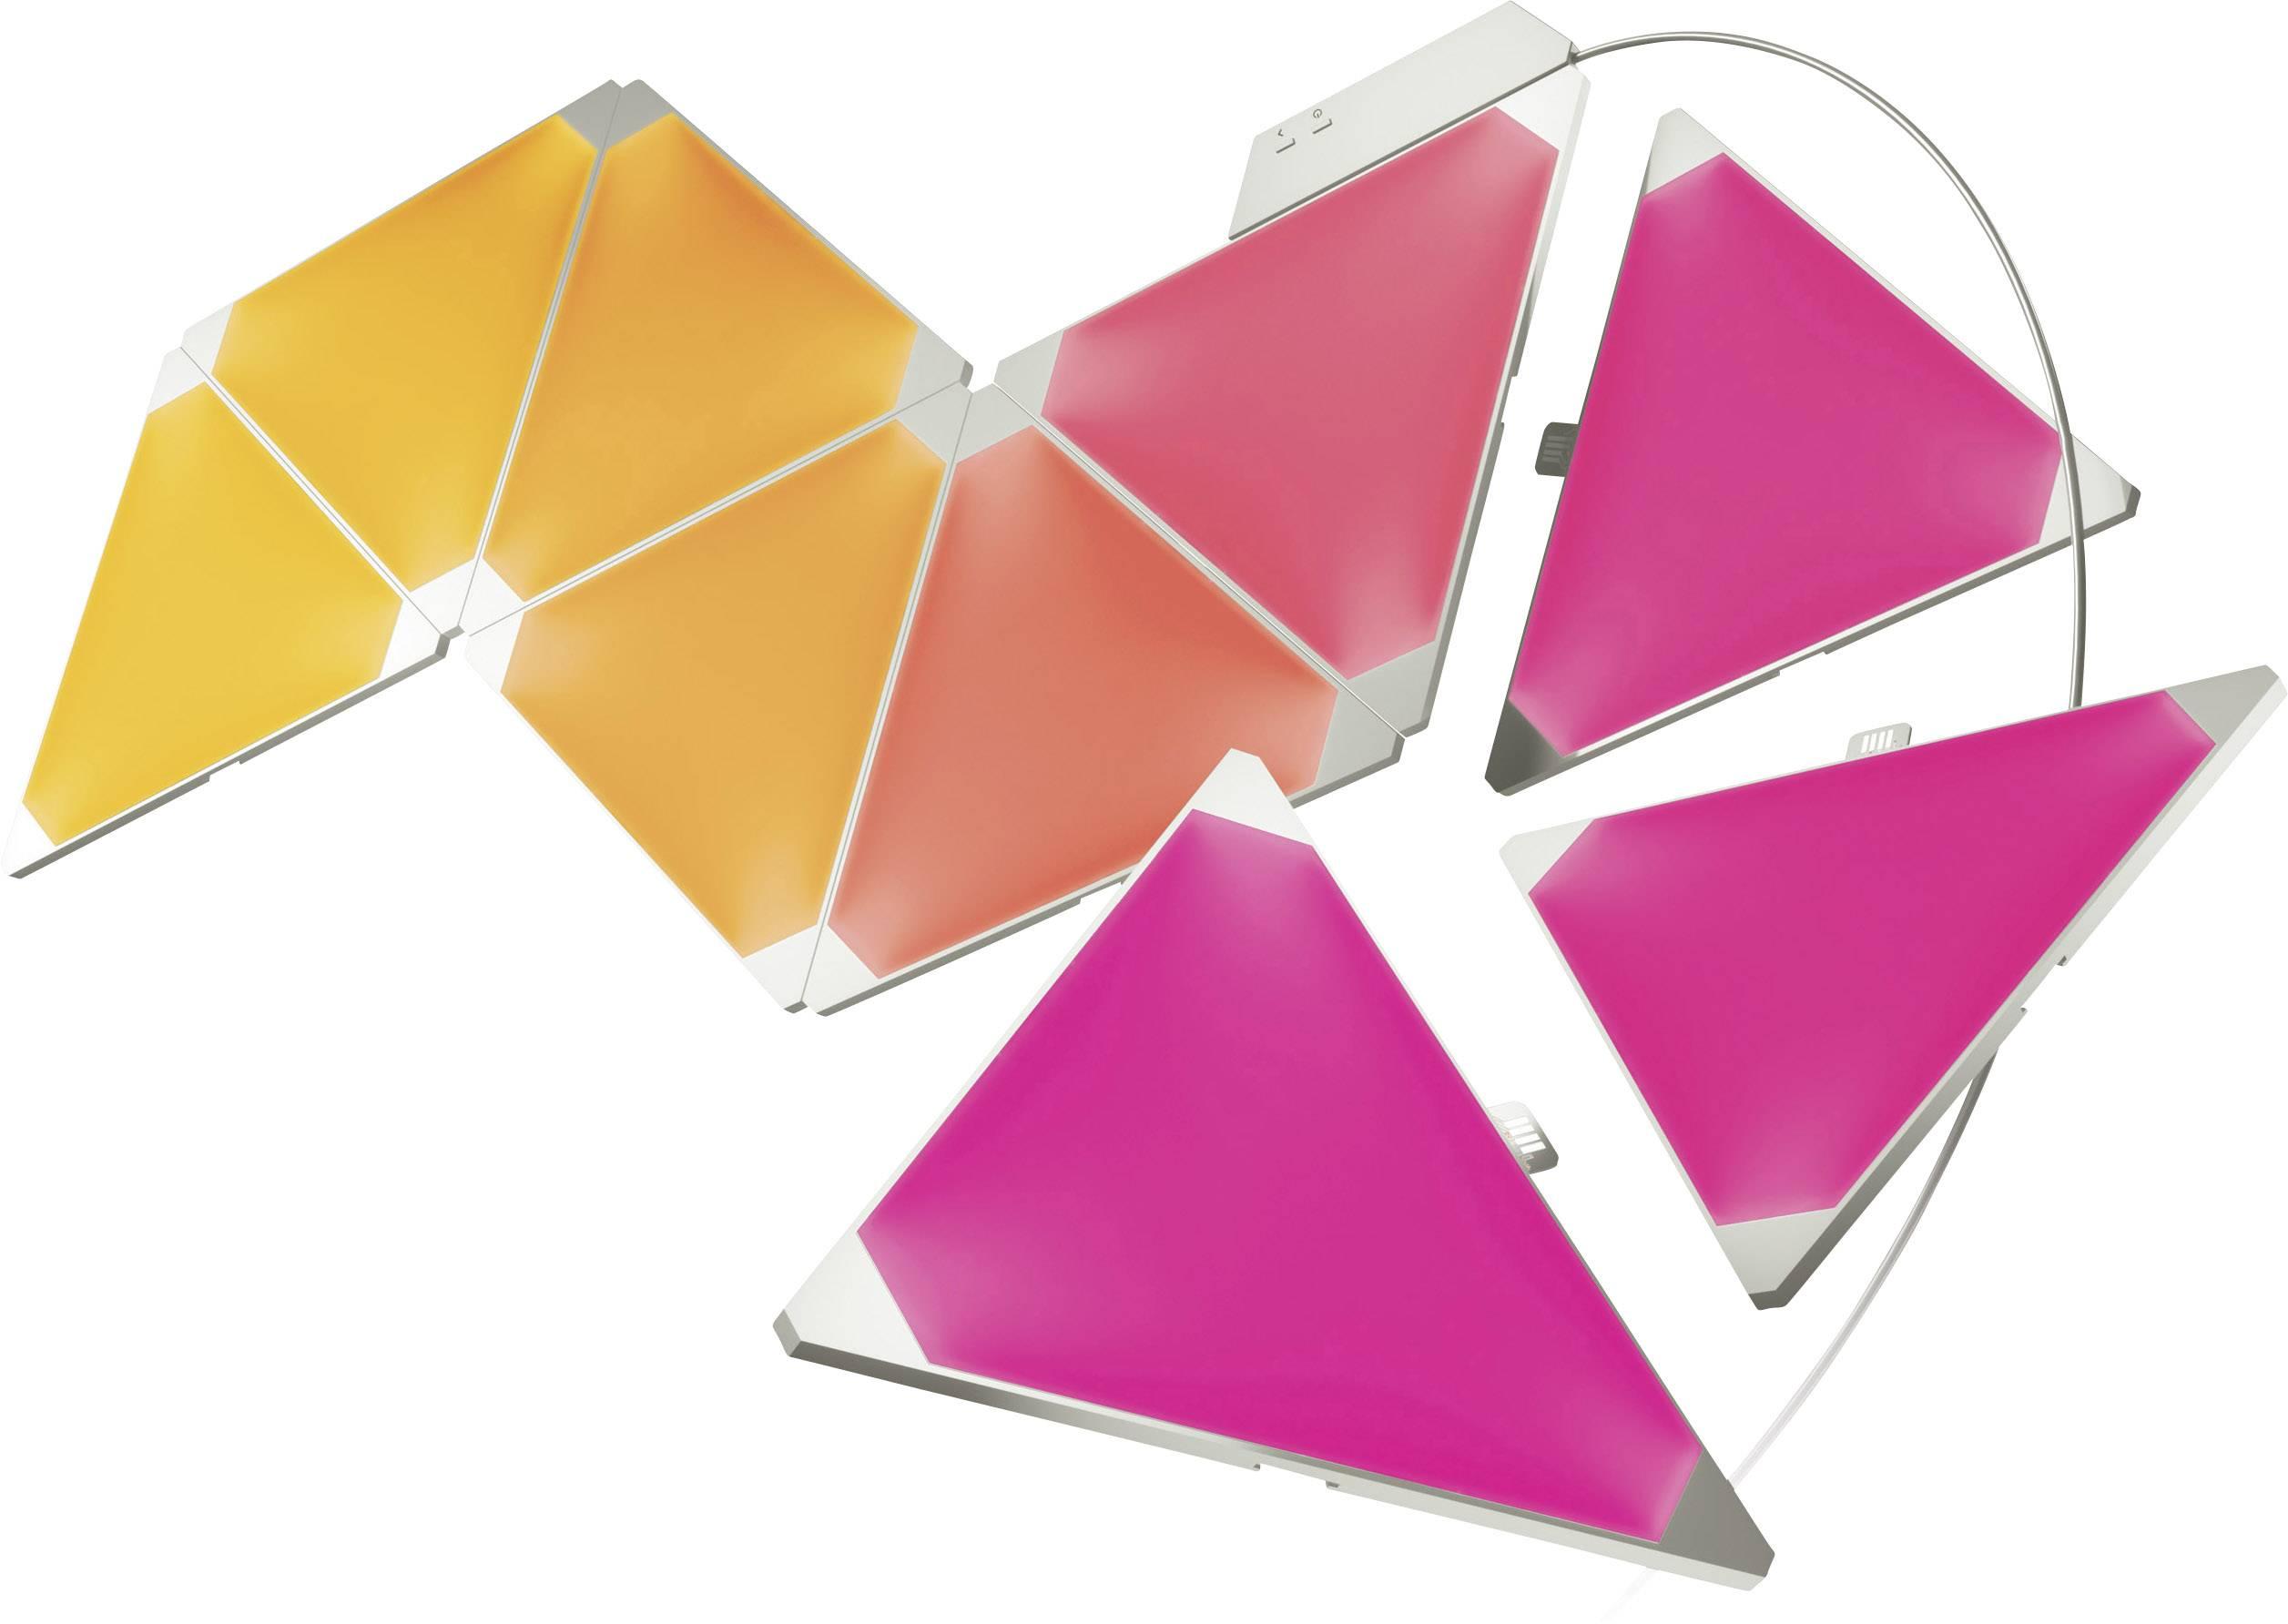 Inteligentné LED dekoračné svetelné panely, rozširujúca sada Nanoleaf Aurora PWZ-5901 s Wi-Fi, 6 W, RGBW